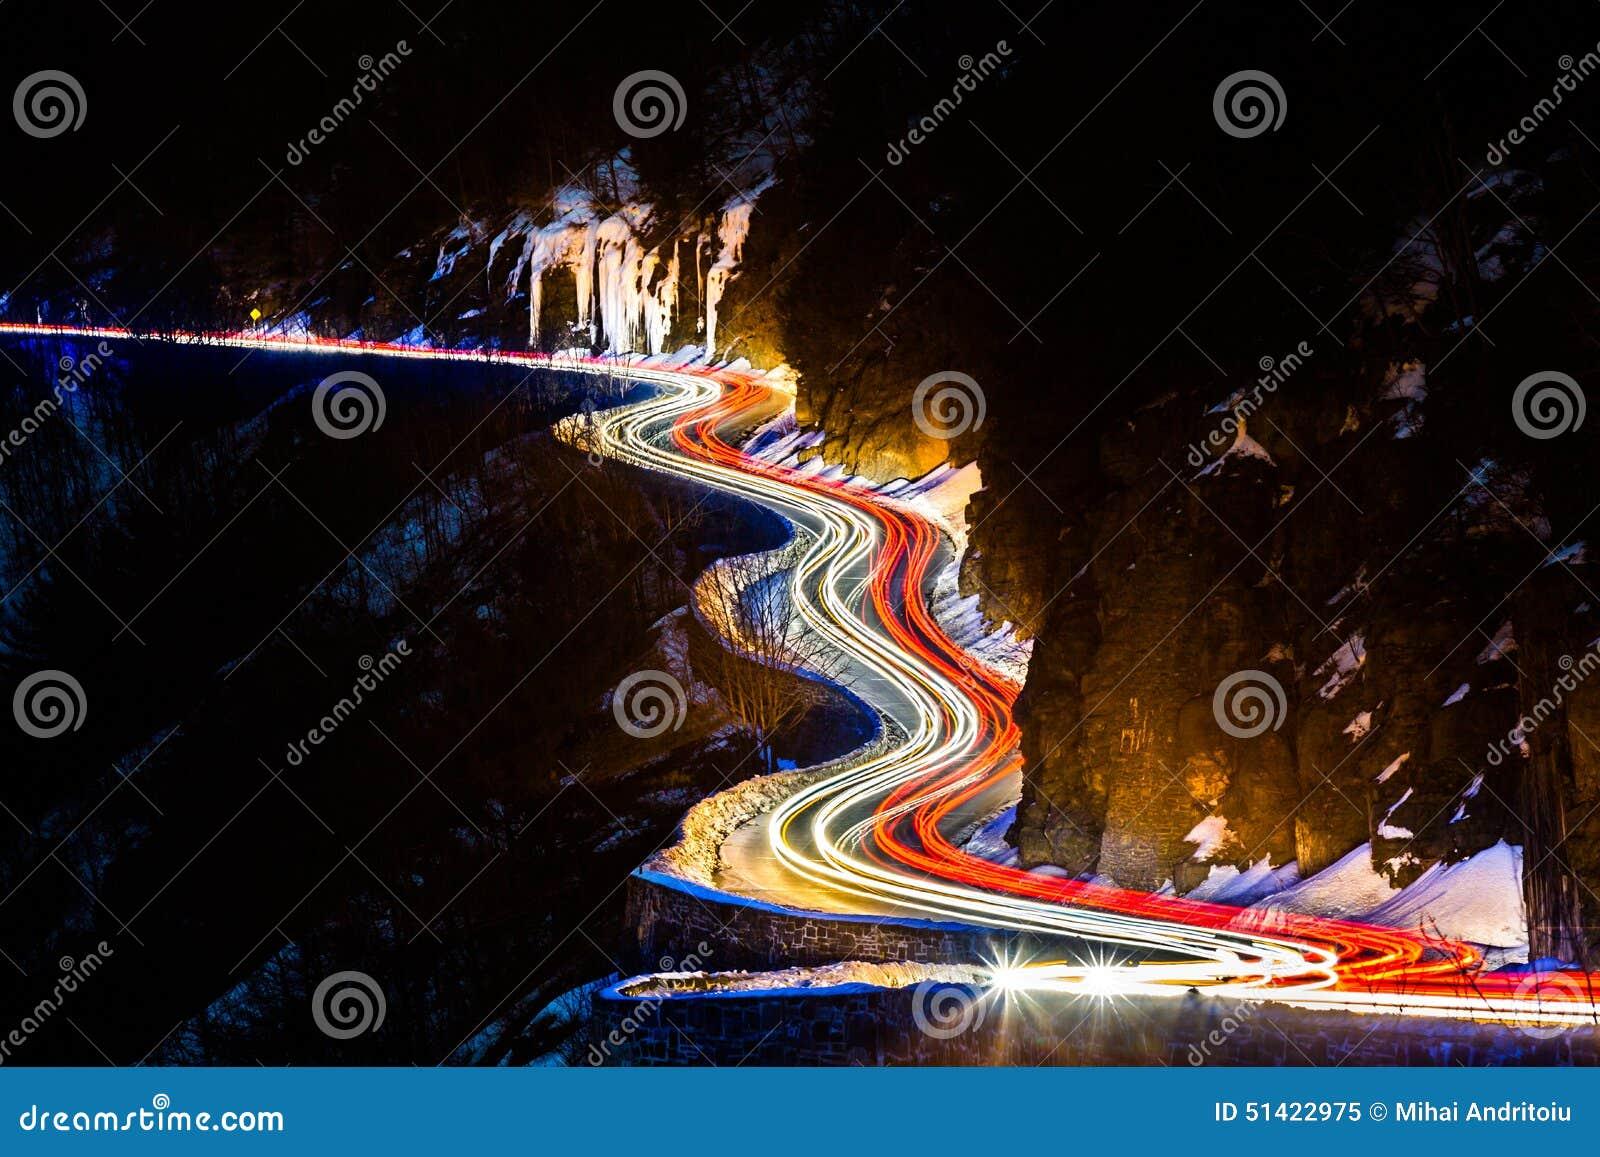 Traffic light trails on the Hawk s Nest winding road